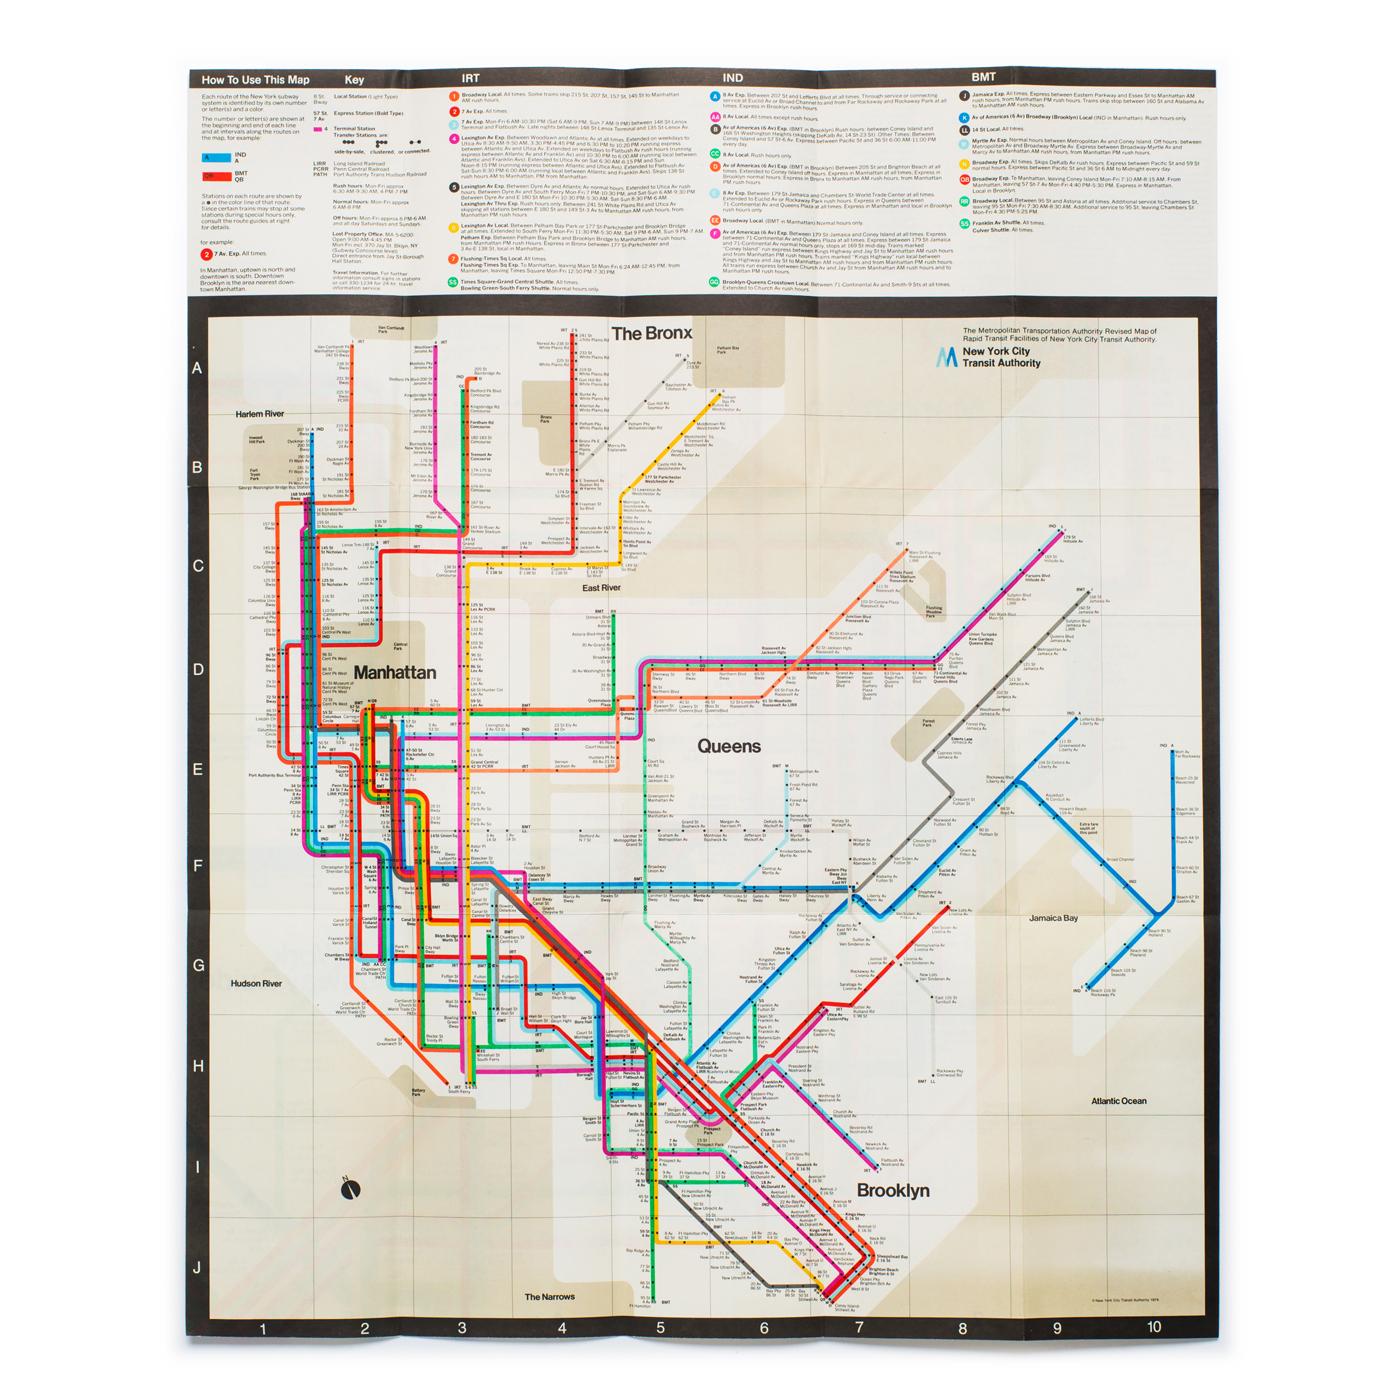 the_nycta_project_massimo_vignelli_subway_map_1974_brian_kelley.jpg